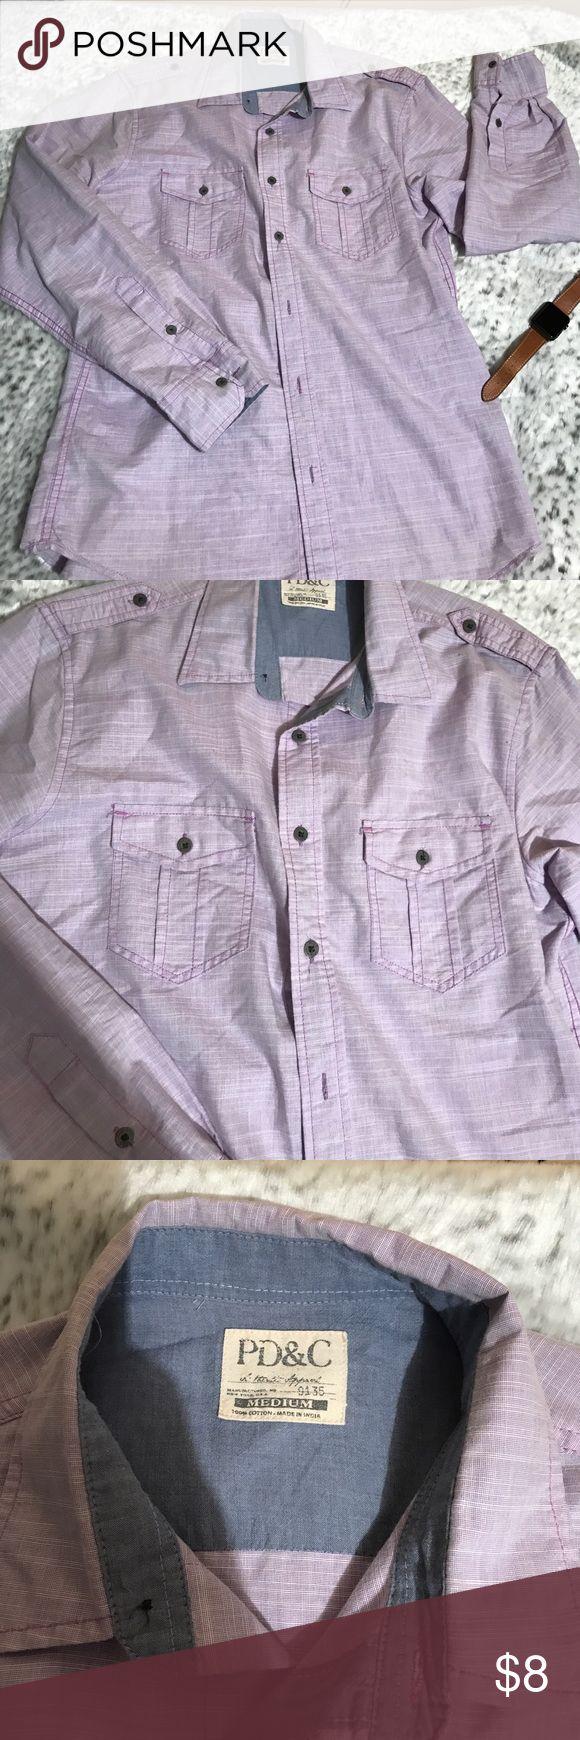 Light purple dress shirt Button down men's shirt. Light purple. Worn 1x. Small little stain seen in photo. Shirts Casual Button Down Shirts